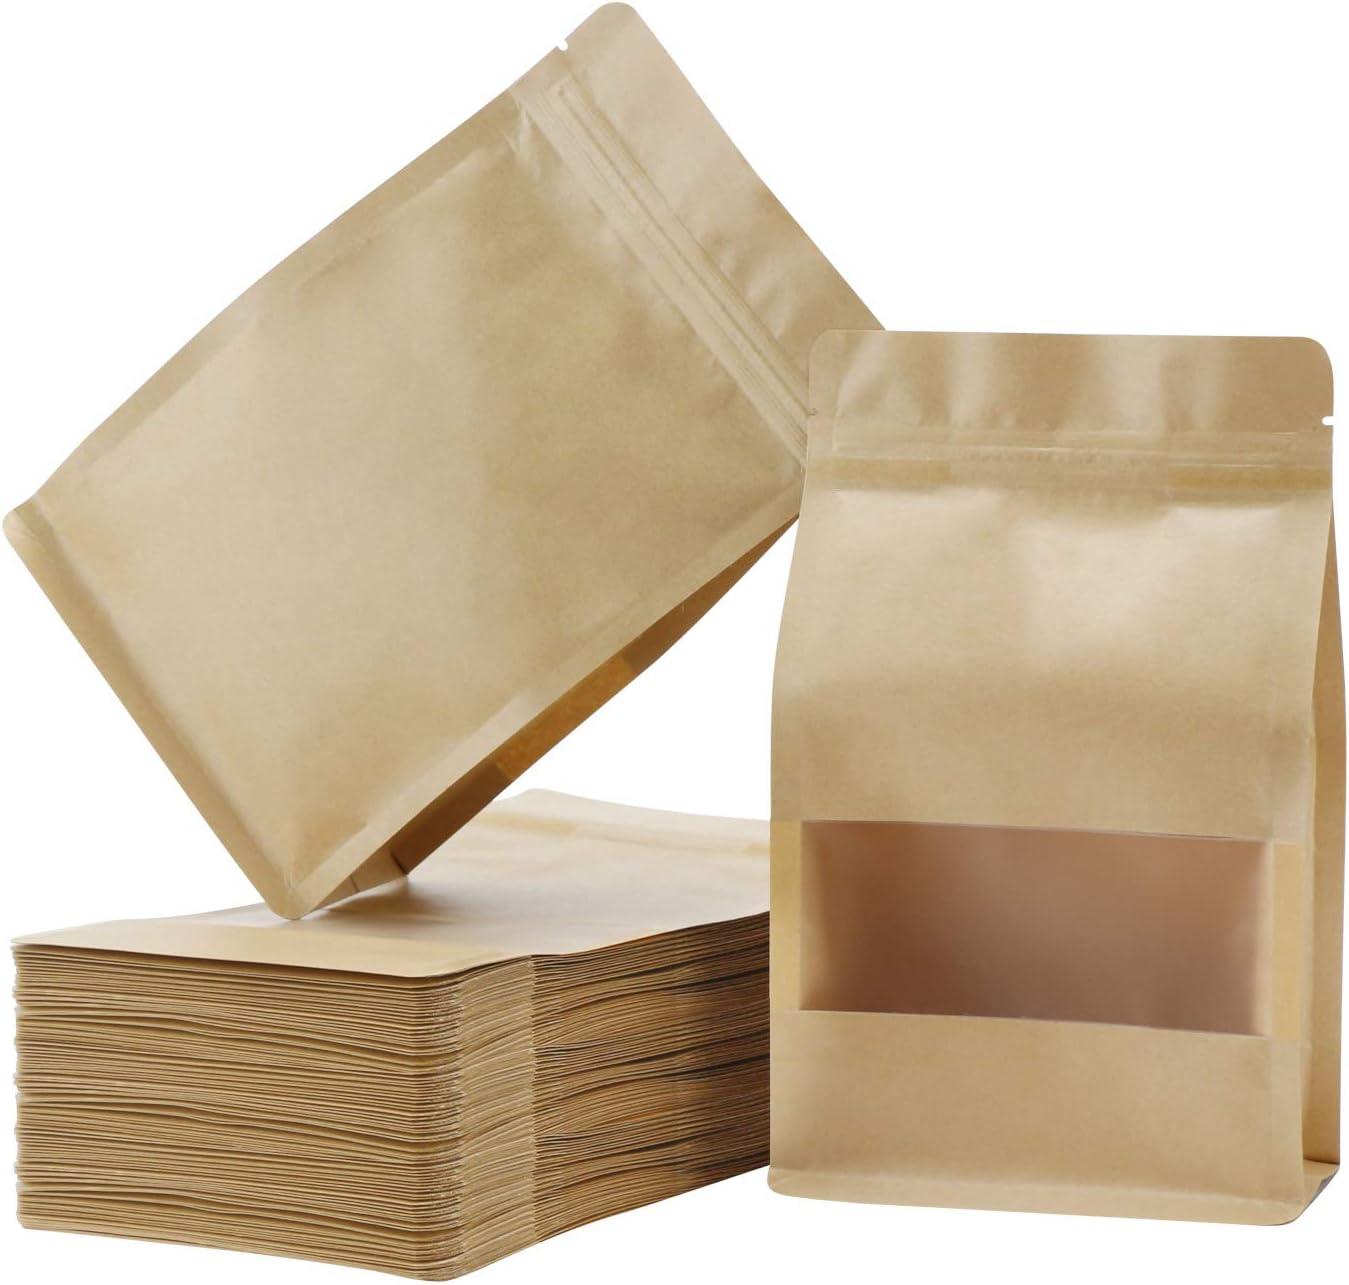 Stand Up Bags, Eusoar 50pcs Kraft Zipper Matte Window Reusable Sealing All-Purpose Food Storage Bags Reclosable Lock with Tear Notch for Nuts Beans Tea (6.3